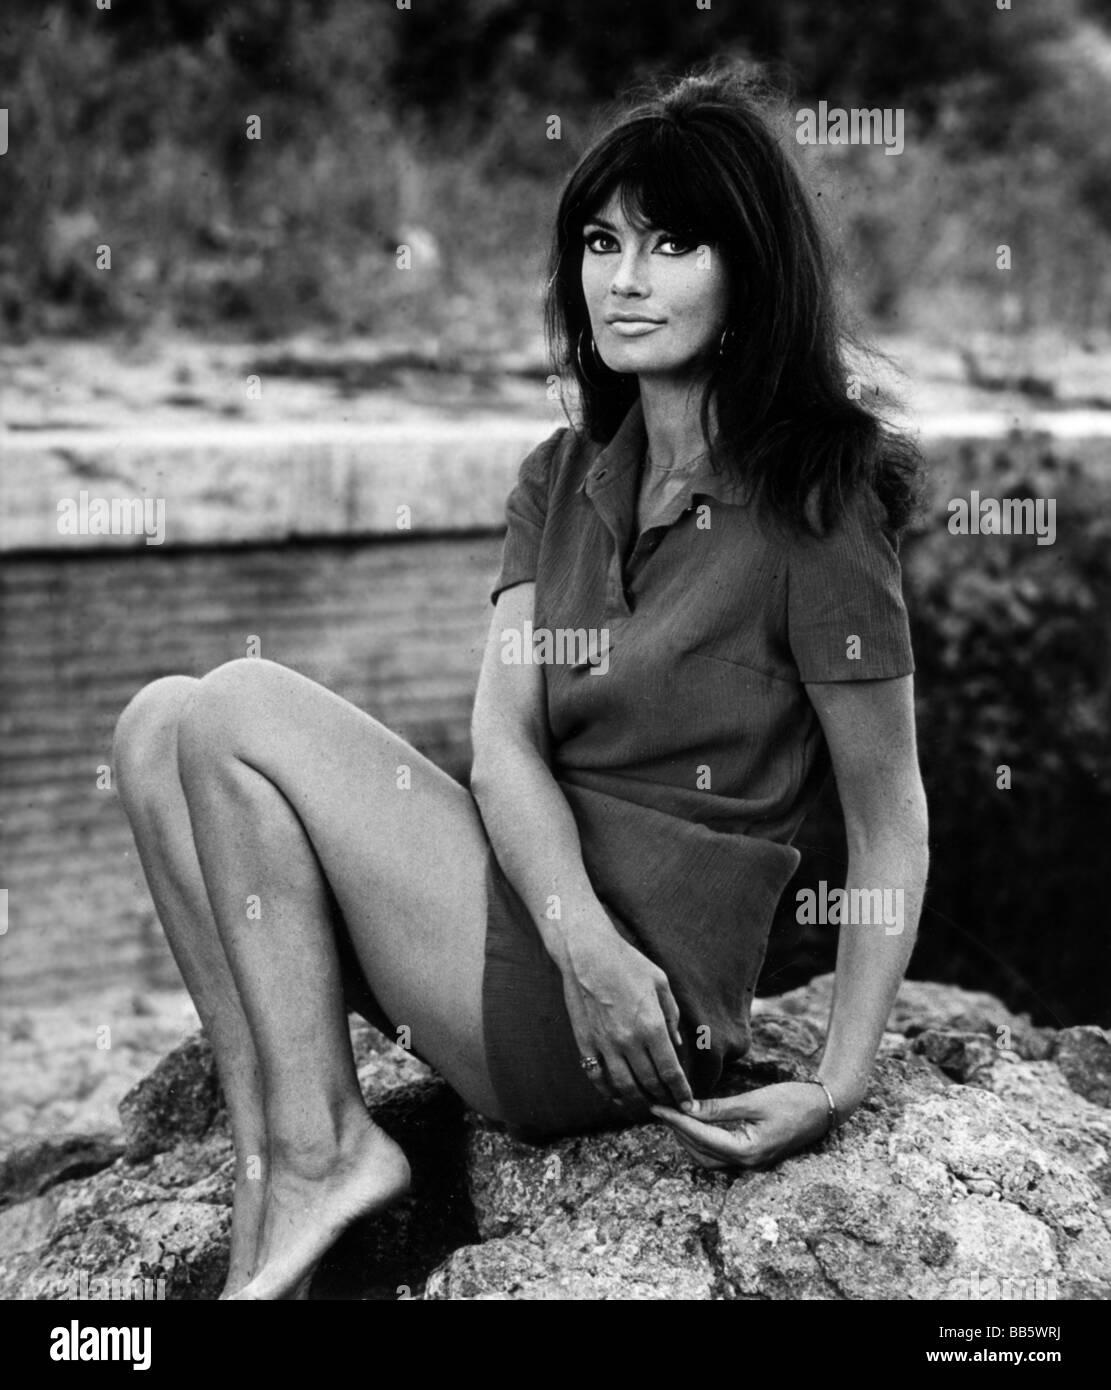 https://c8.alamy.com/comp/BB5WRJ/mell-marisa-2421939-1651992-austrian-actress-half-length-1960s-additional-BB5WRJ.jpg